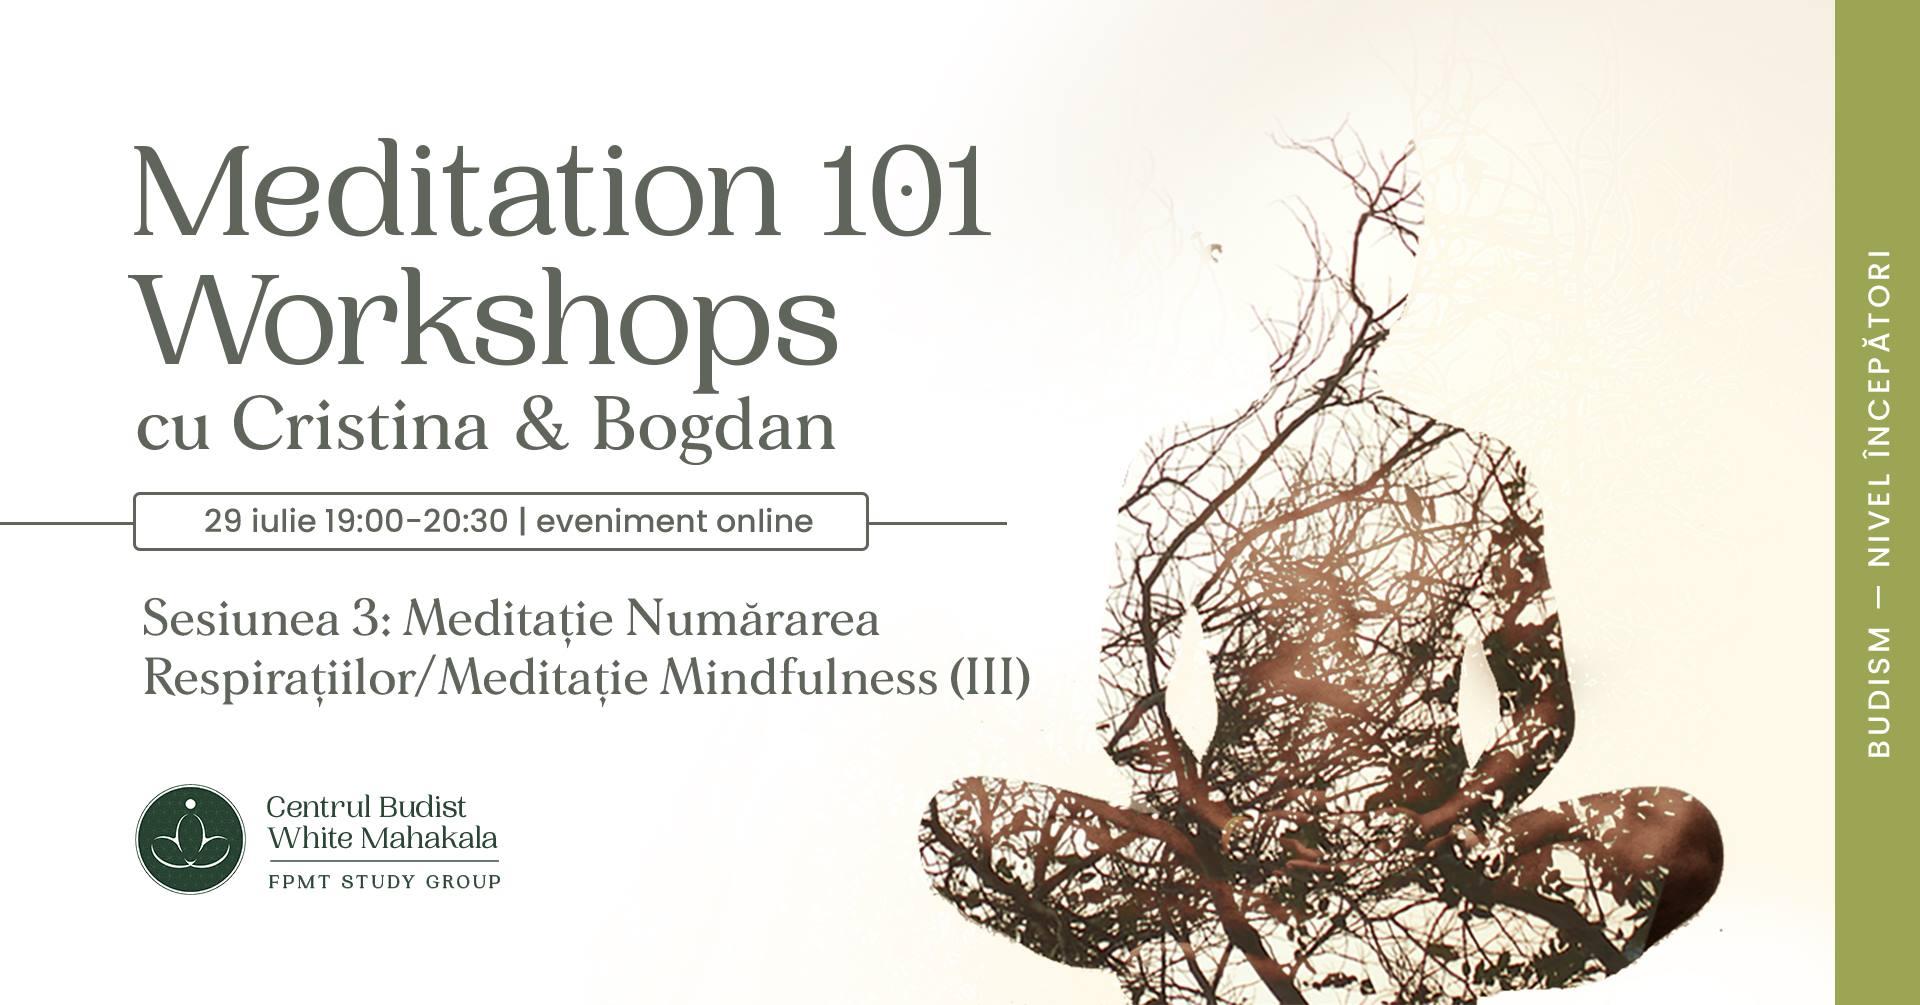 MEDITATION 101- Workshops Sesiunea 1: Meditatie Numararea Respiratiilor/Meditatie Mindfulness (III)